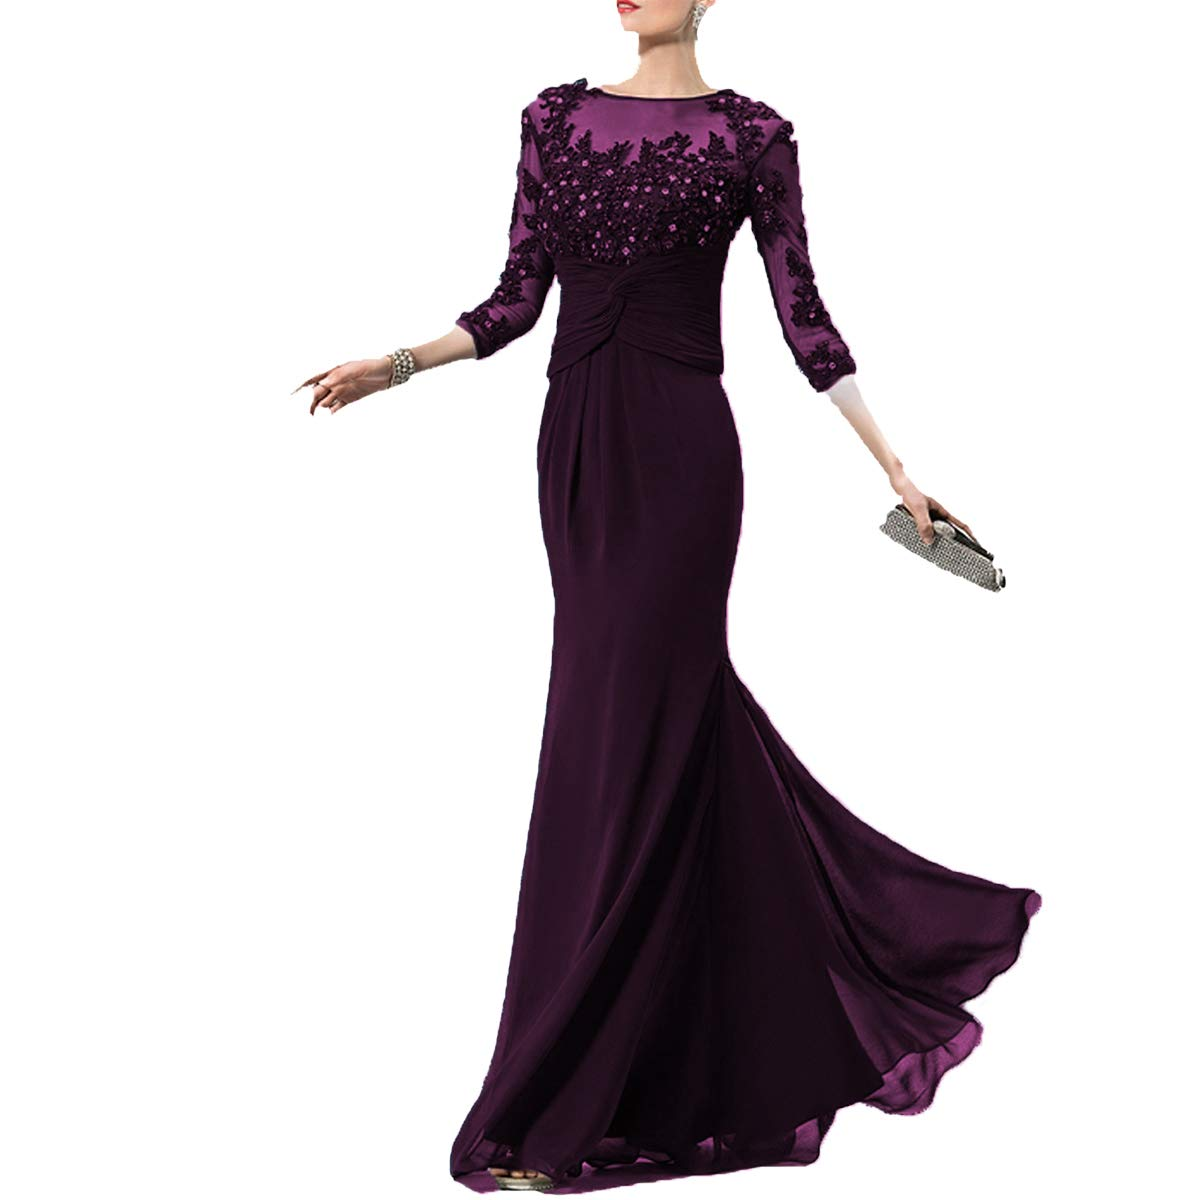 Dark Purple SDRESS Women's Rhinestones Appliques Illusion 3 4 Sleeve Scoop Neck Mother Dress